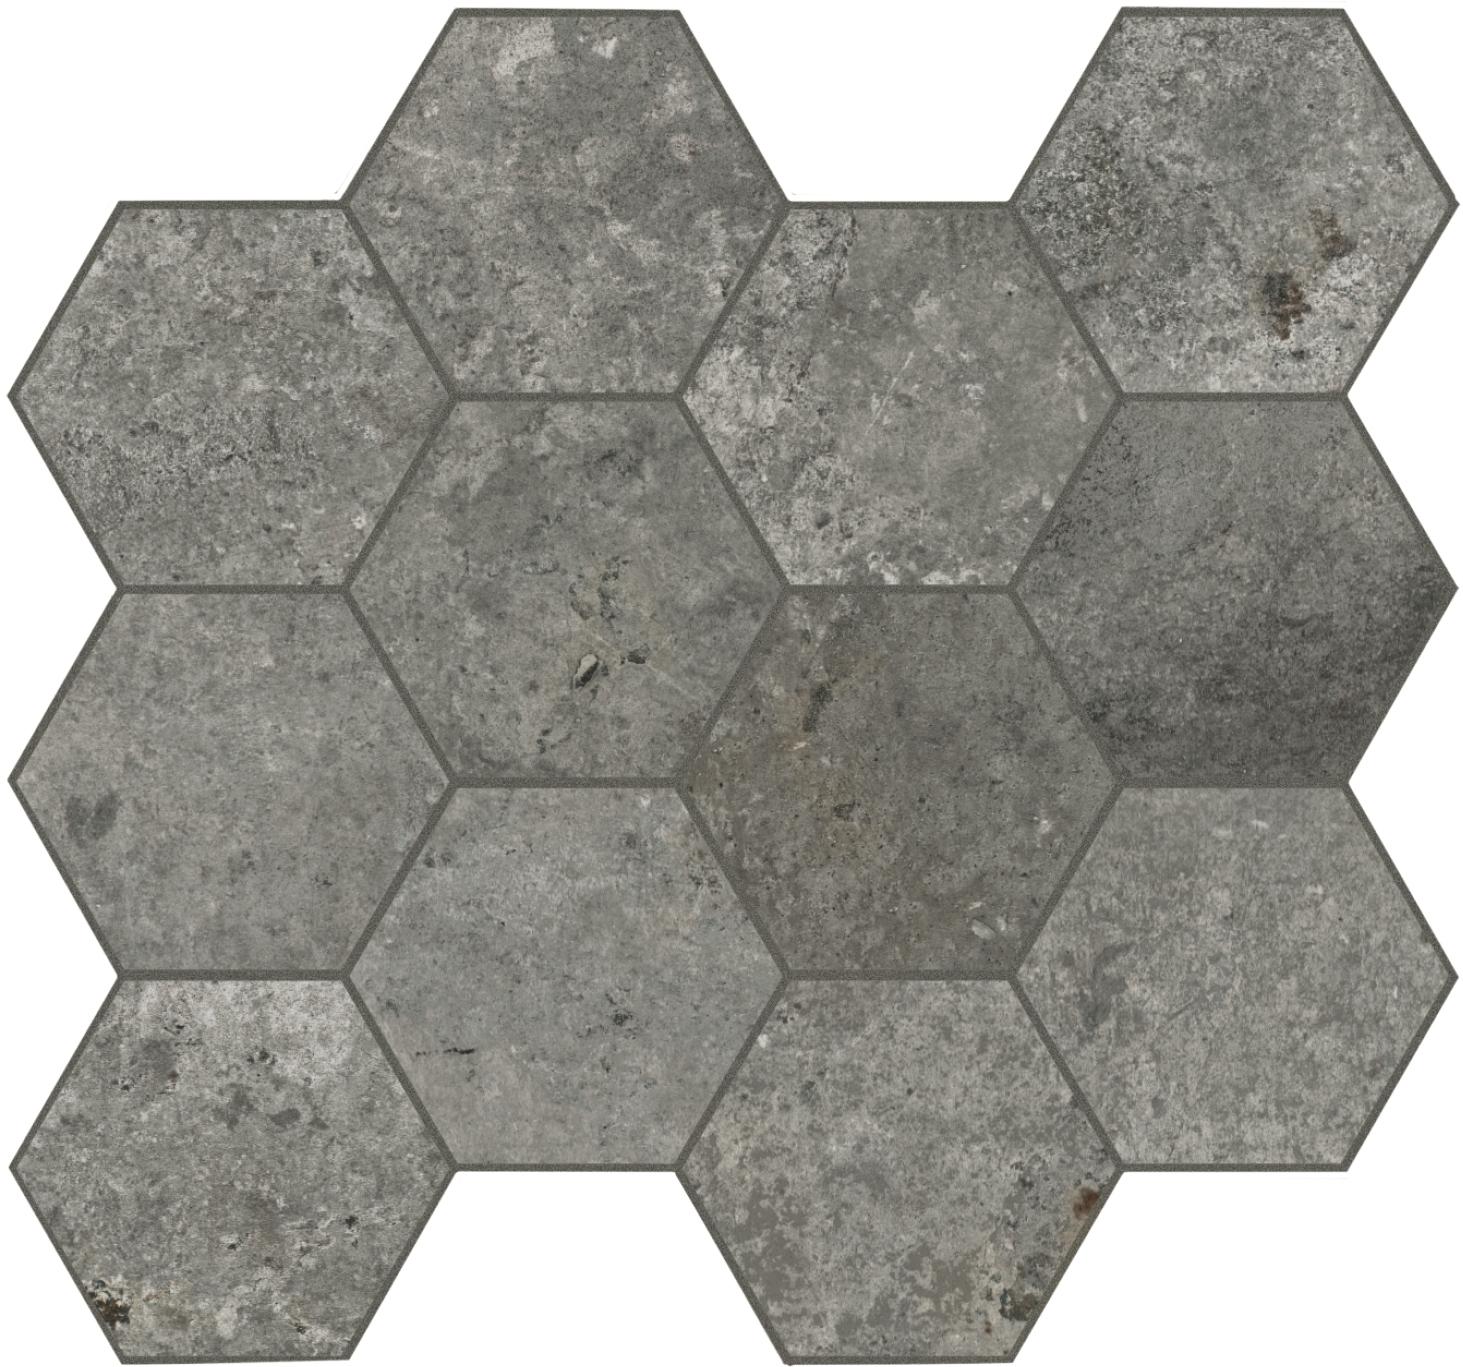 Unicom Starker DEBRIS SOOT HEXAGON UNI-0008043 Mosaik 30x34 Matt